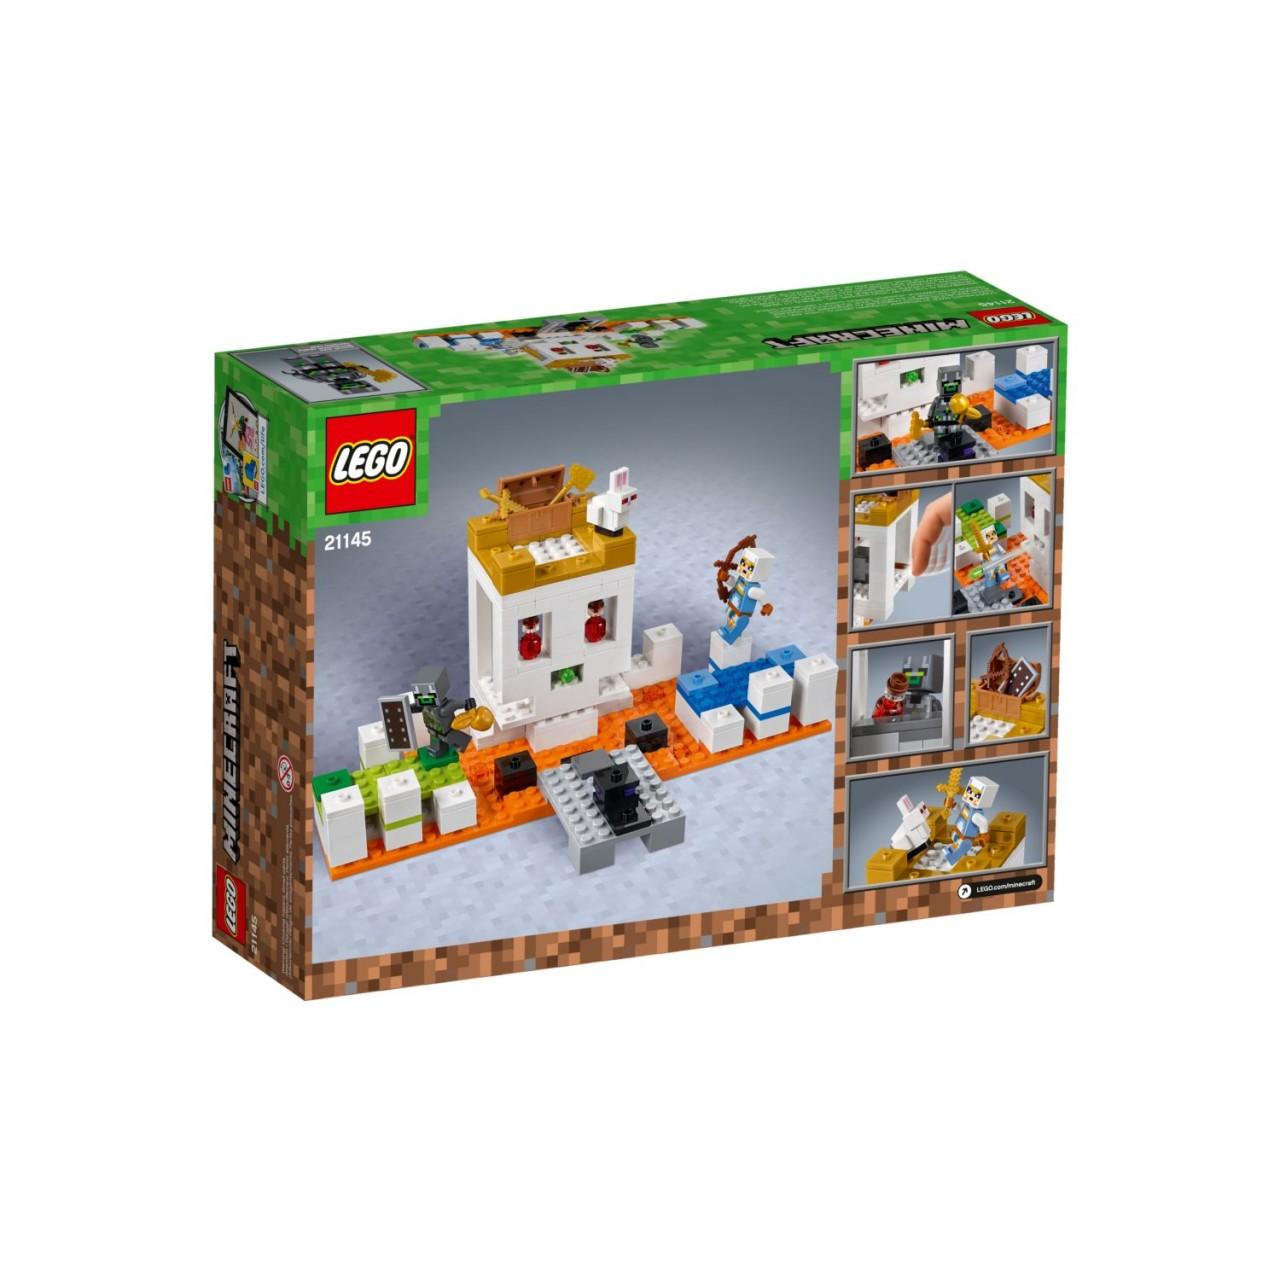 LEGO MINECRAFT 21145 Die Totenkopfarena